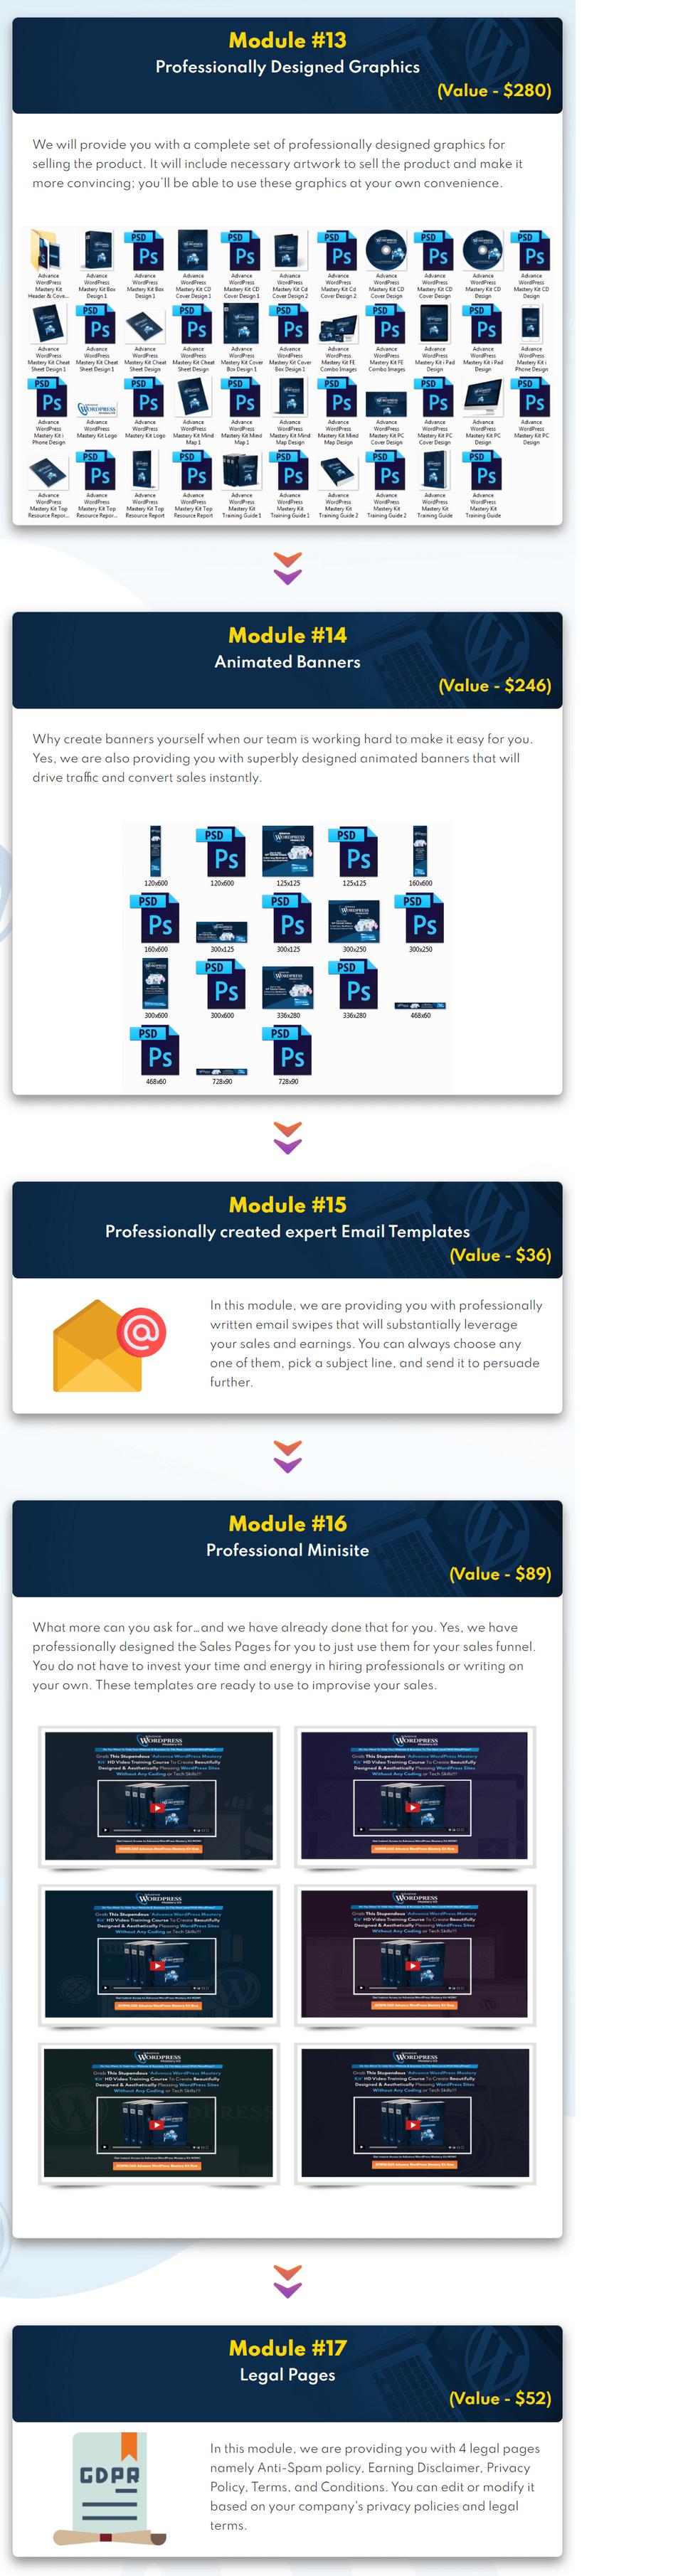 Advance-WordPress-Mastery-Kit-PLR-feature-5